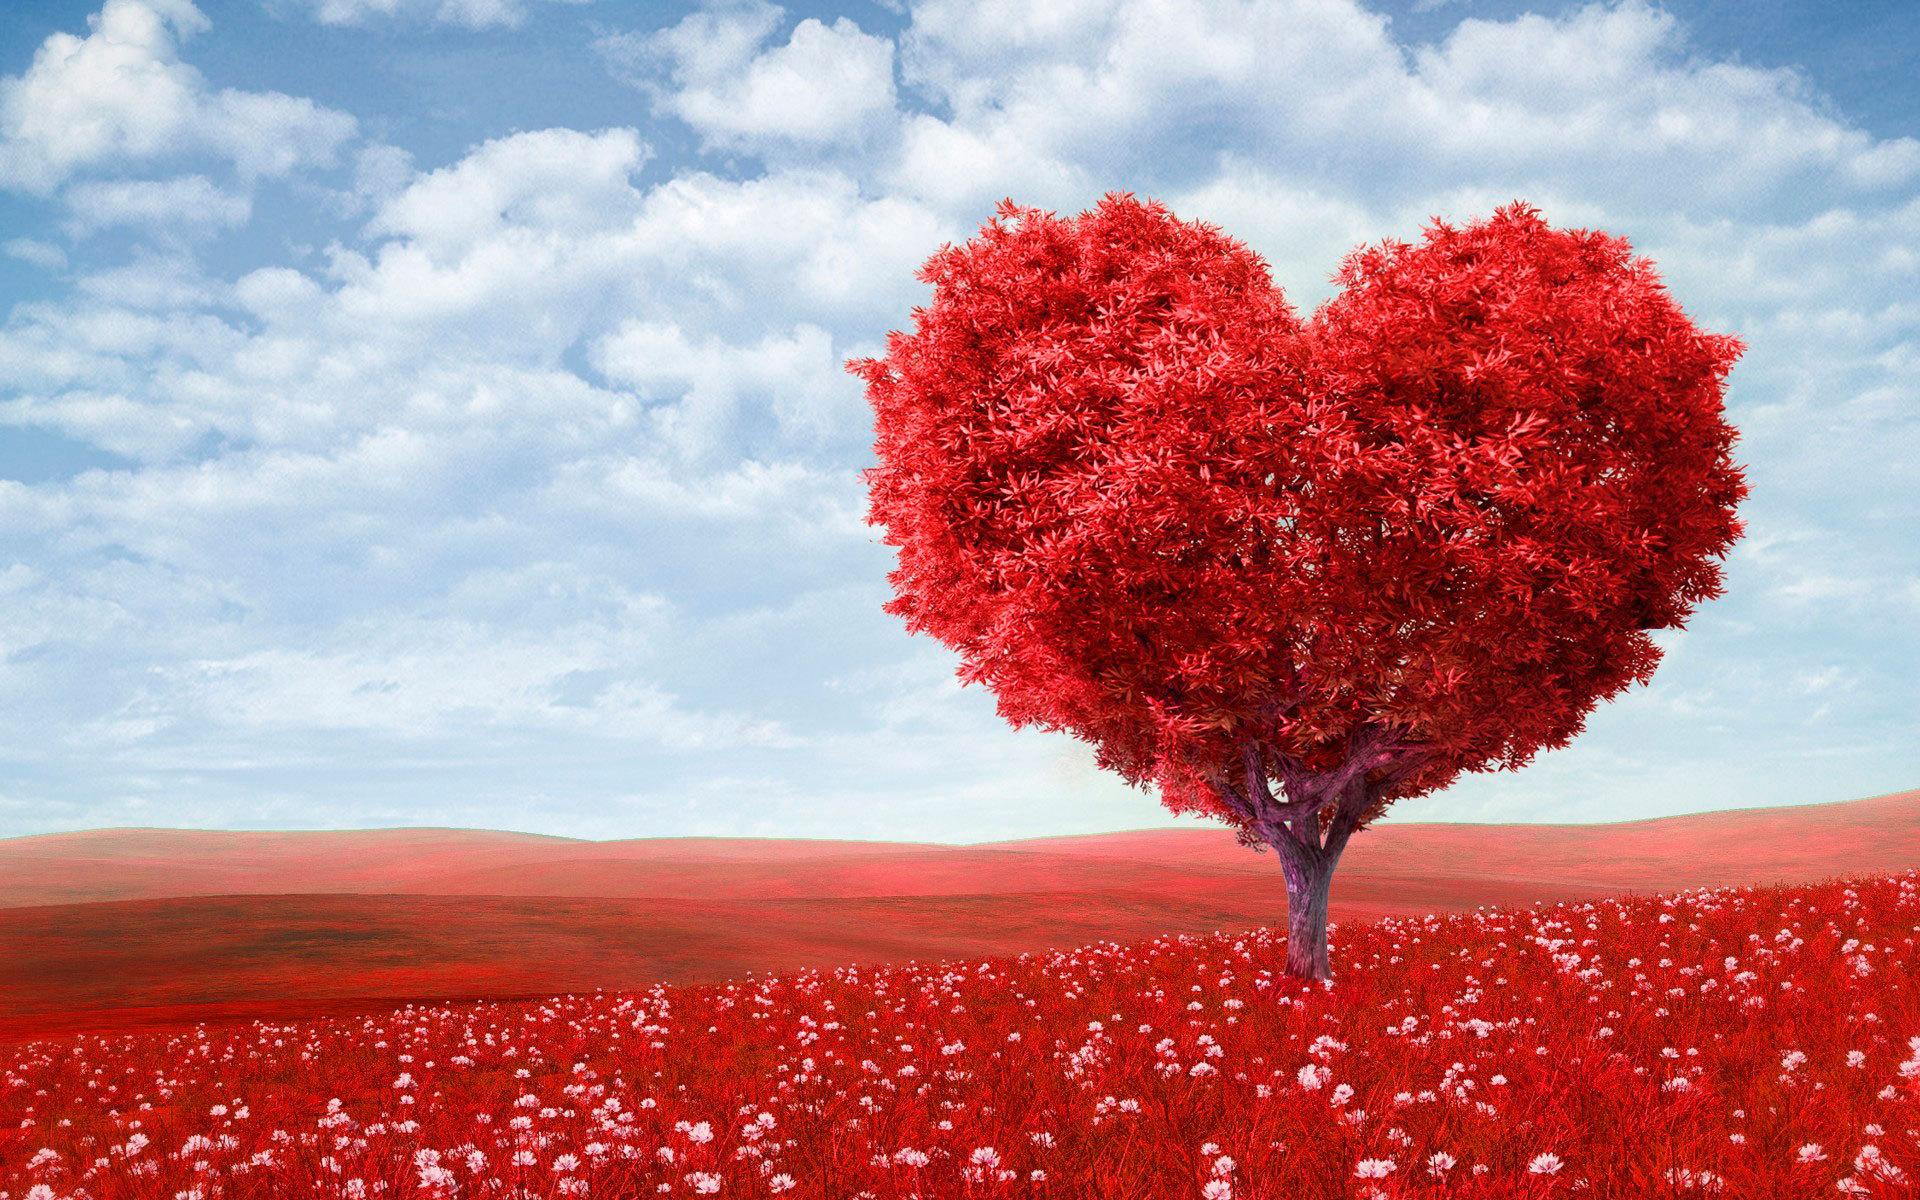 1420485923_holidays___saint_valentines_d